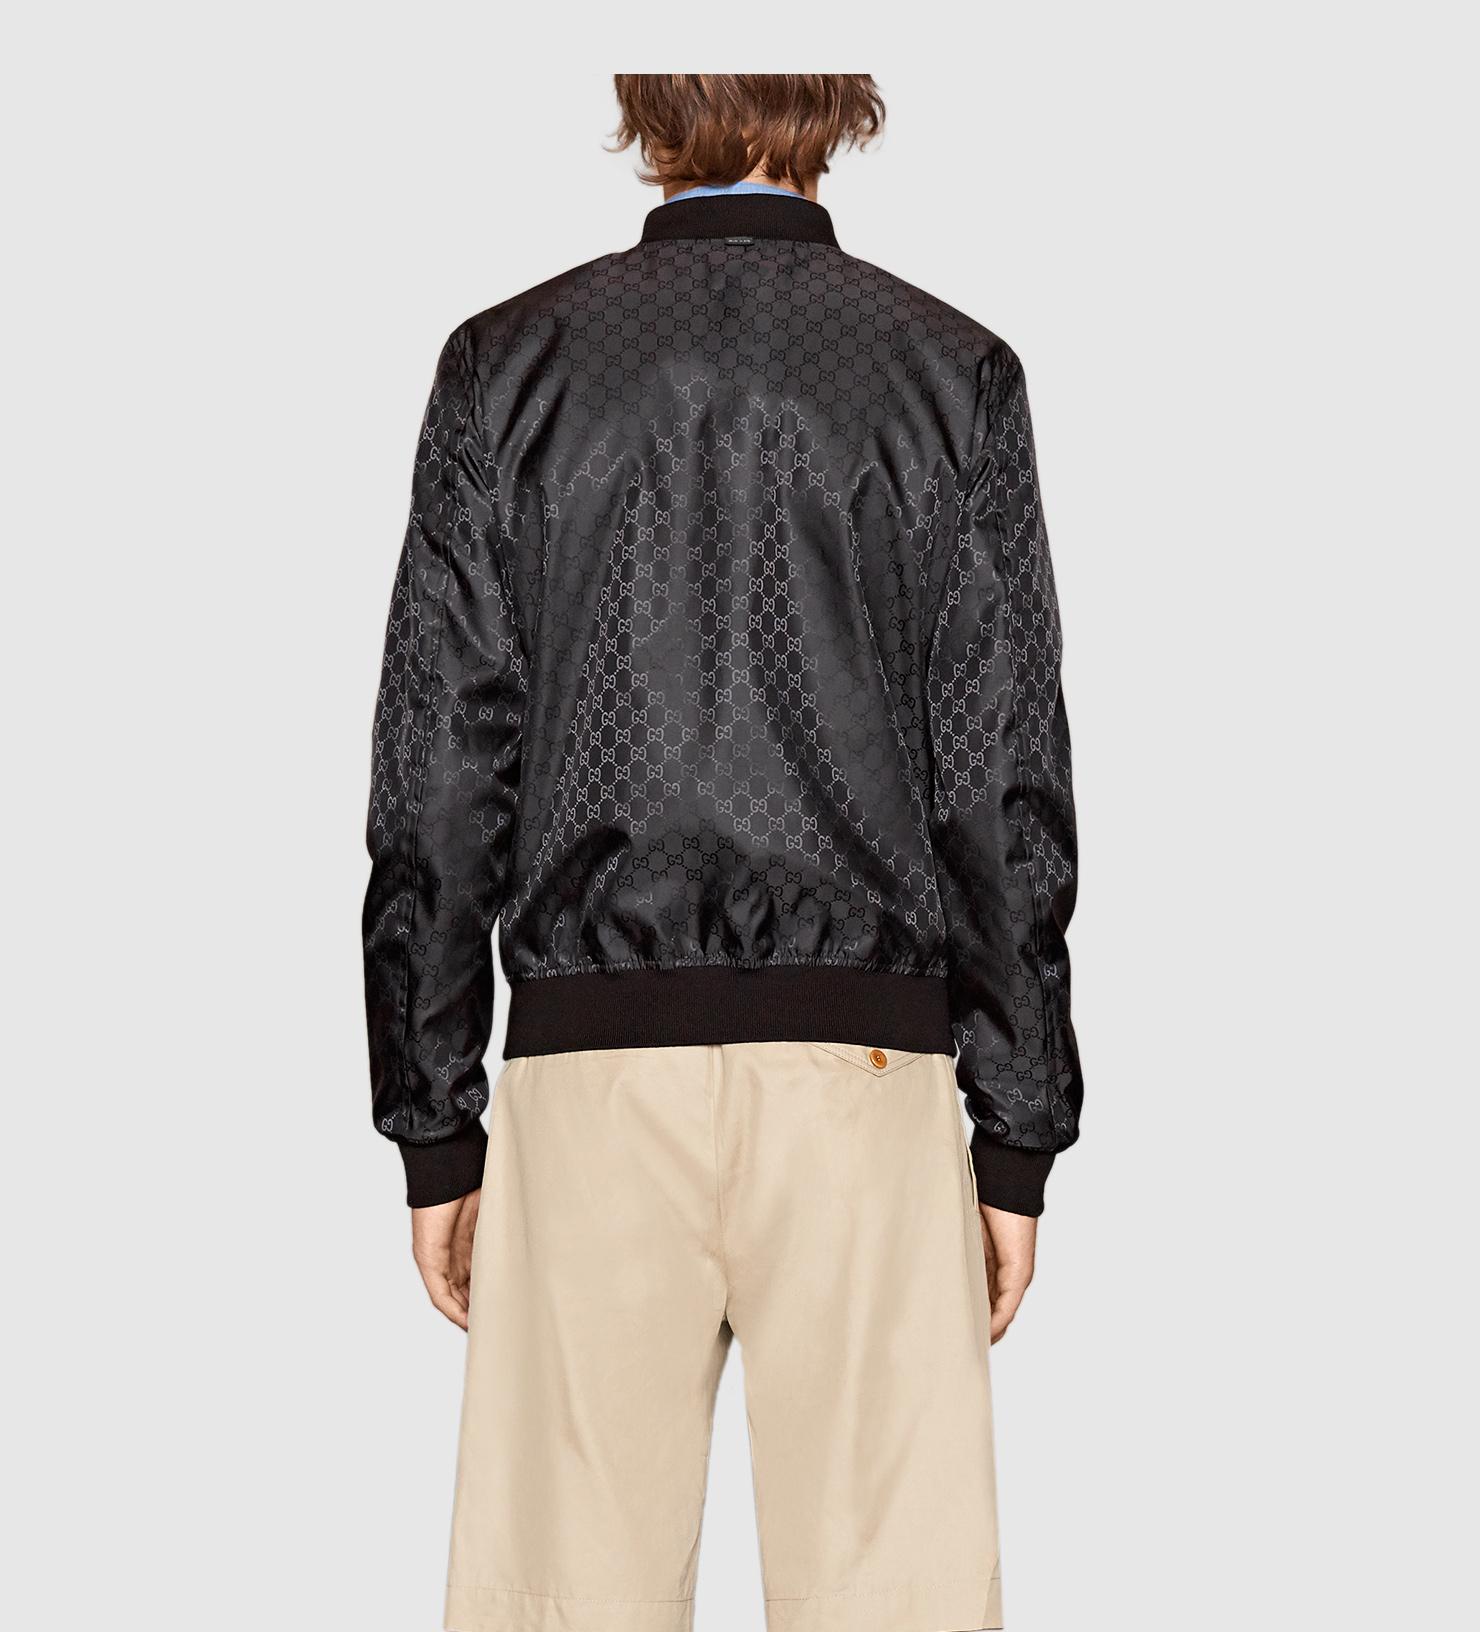 7986c3ebe3ac Gucci Reversible Gg Jacquard Nylon Bomber Jacket in Black for Men - Lyst